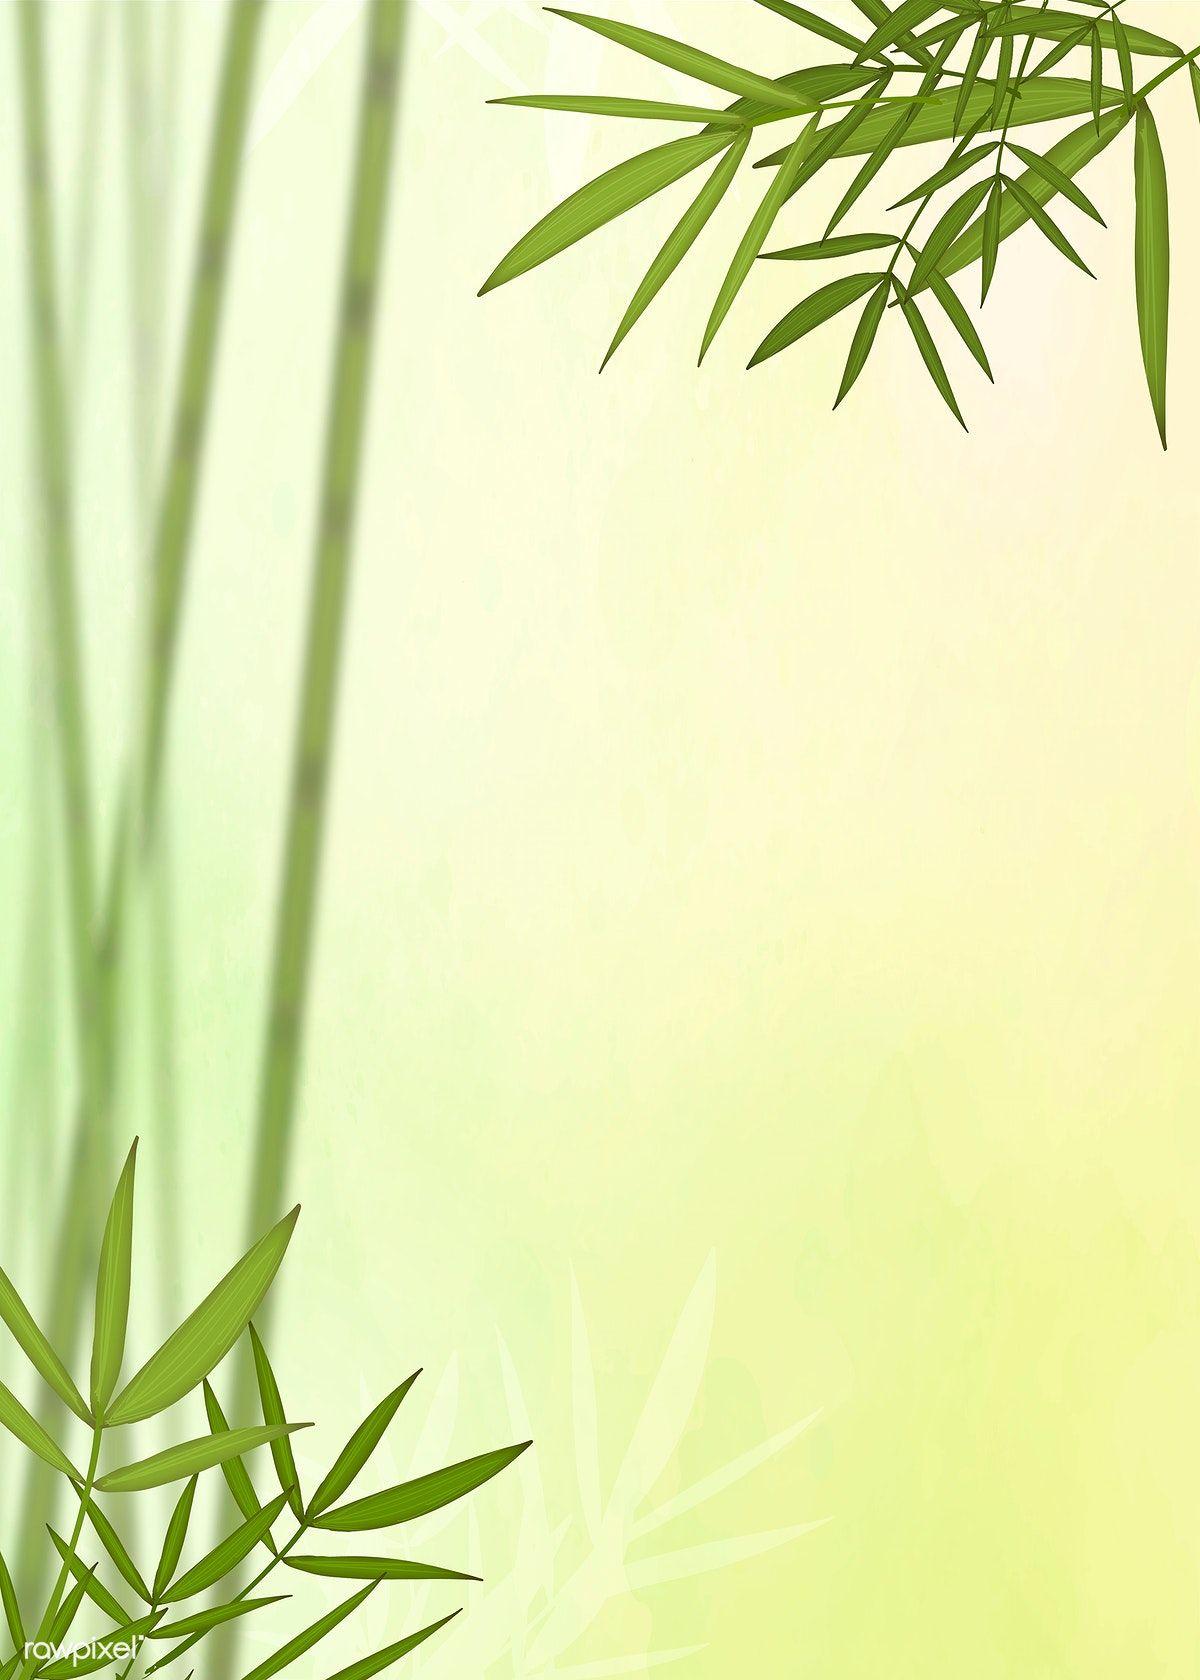 Baground Hijau Daun : baground, hijau, Bamboo, Elements, Green, Background, Image, Rawpixel.com, Hijau,, Daun,, Bambu